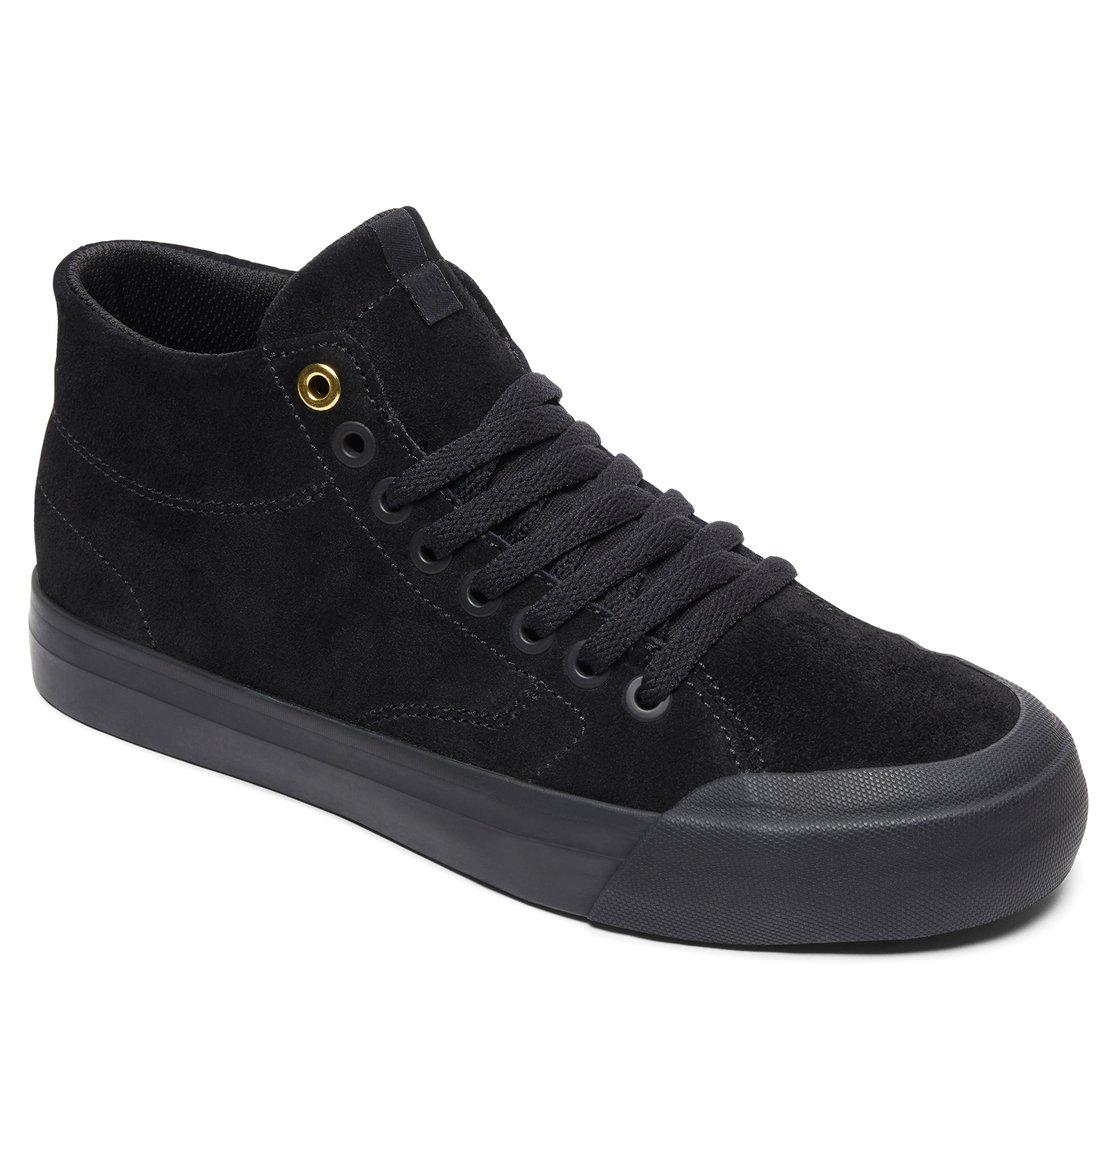 2b91dcd805b8 DC Shoes™ Women's Evan HI Zero SE - High-Top Shoes ADJS300222   eBay